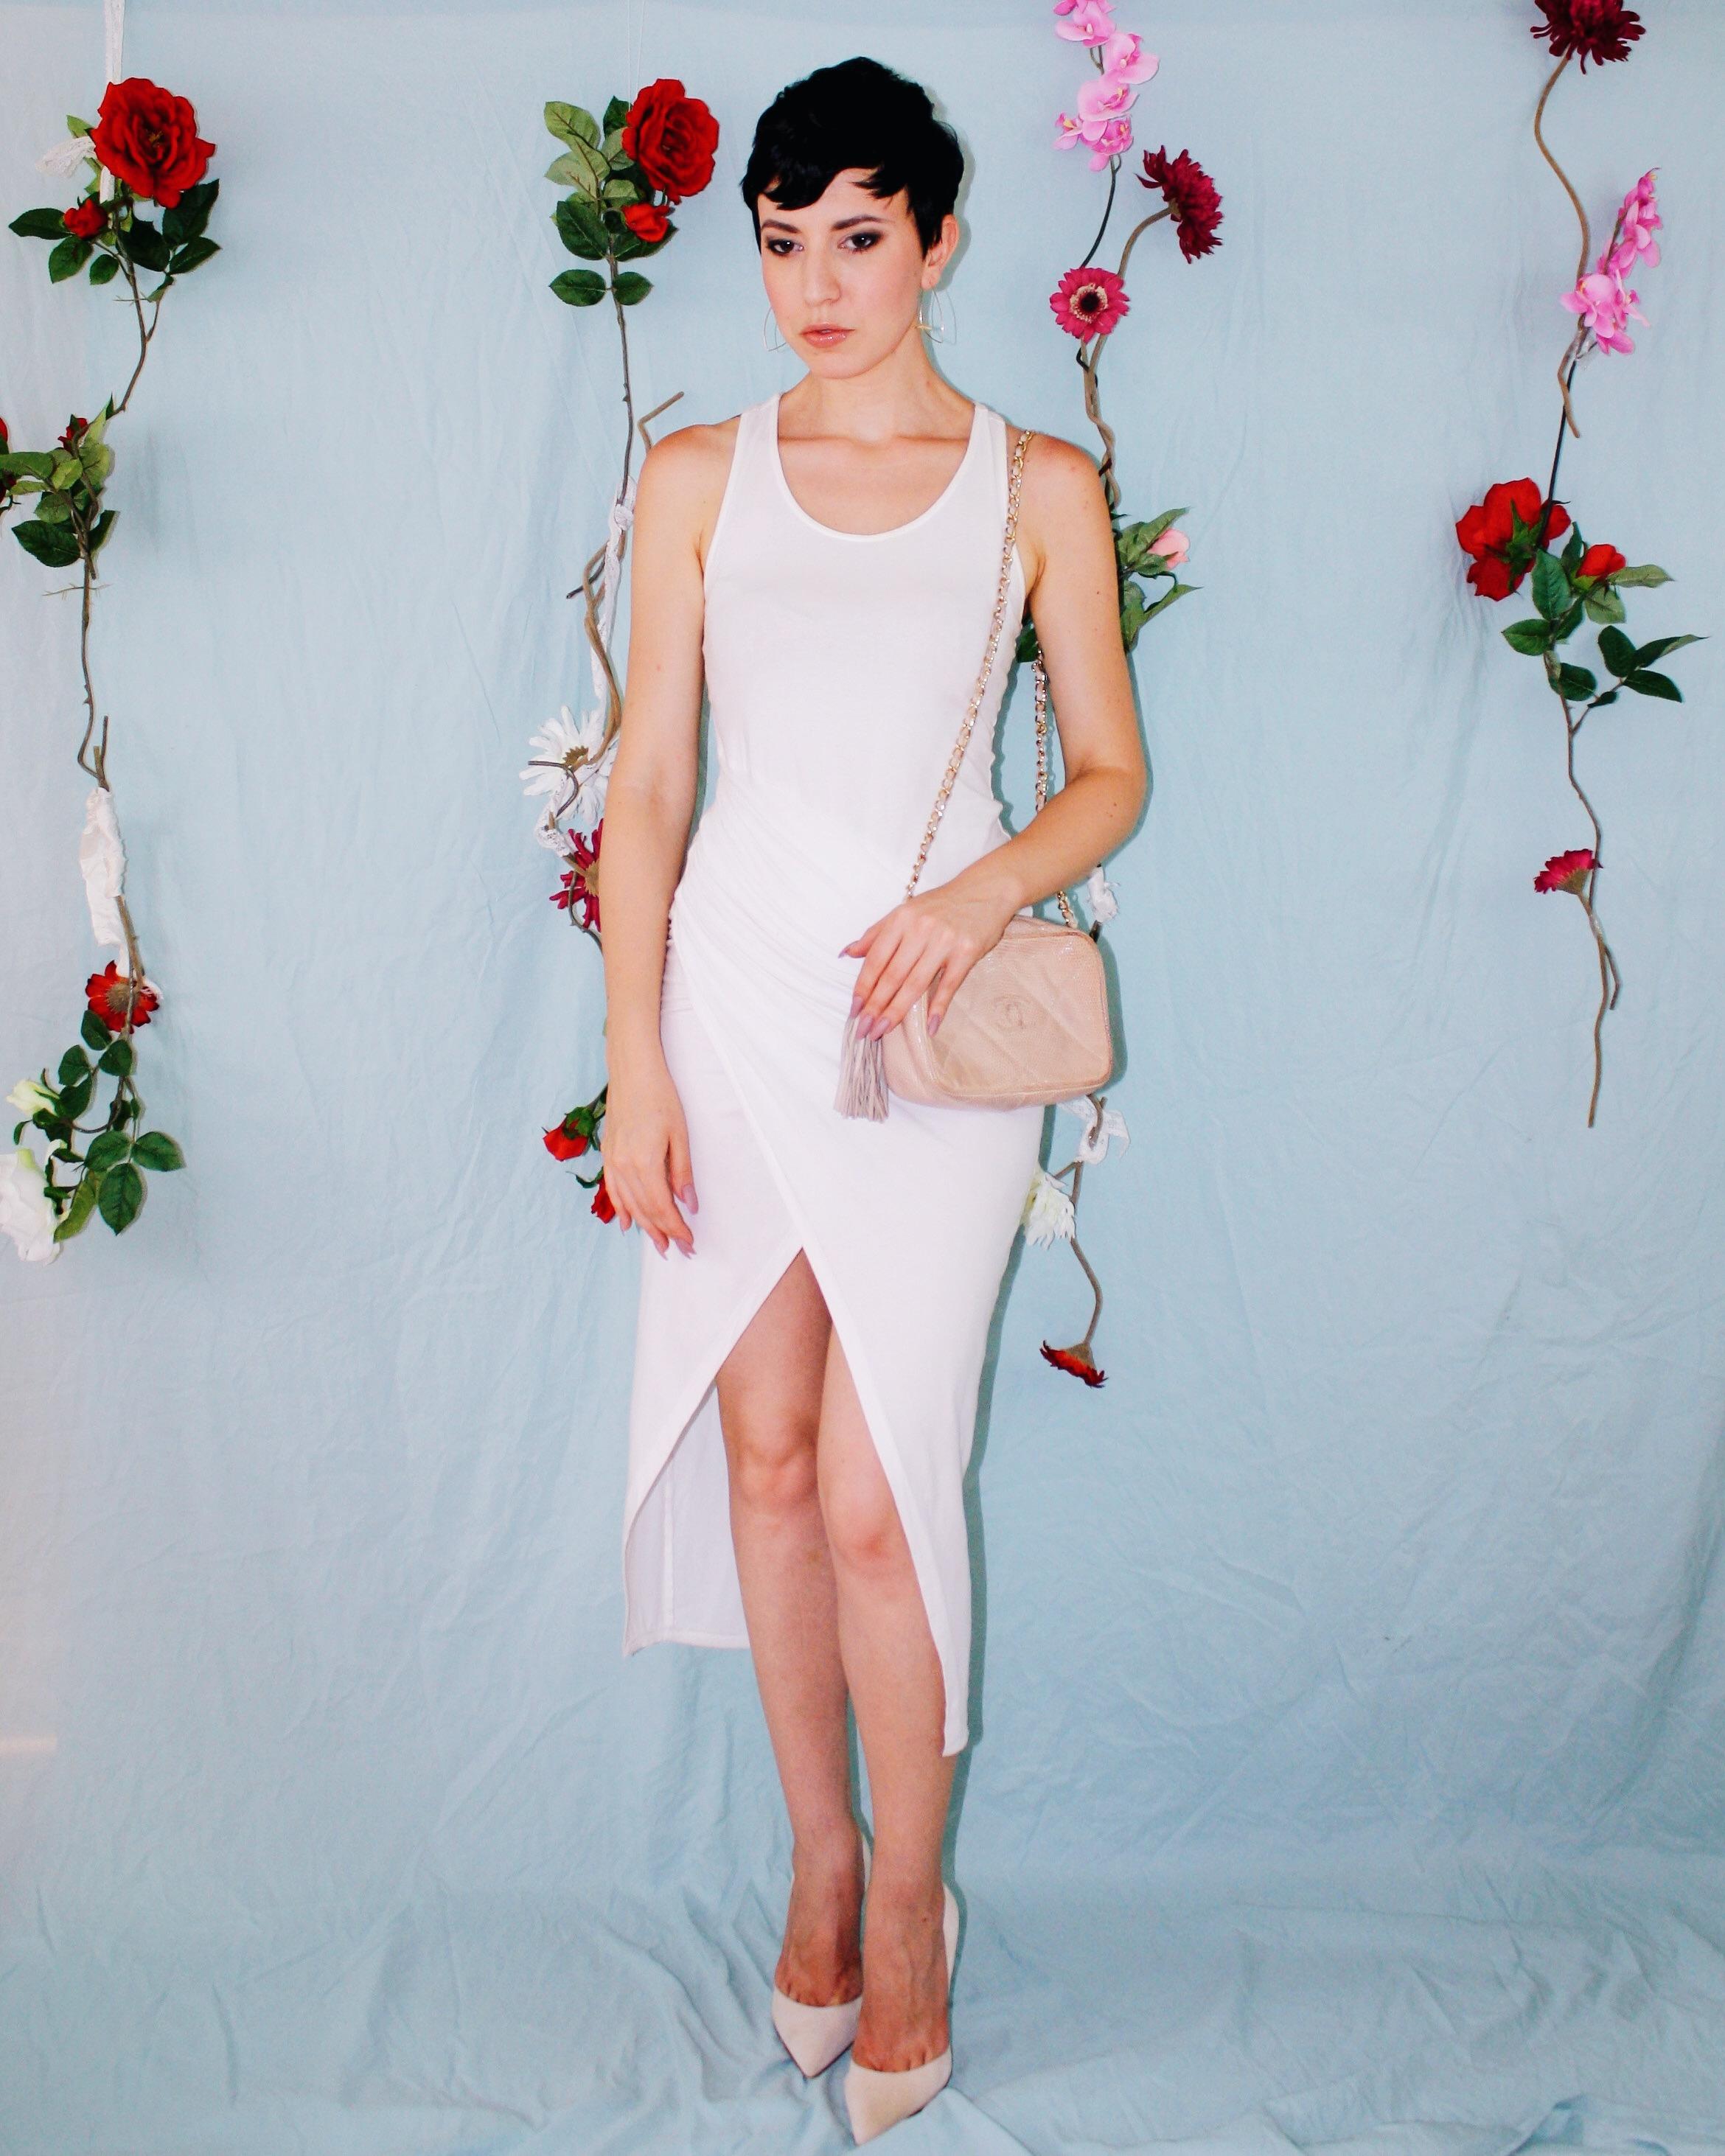 labor day outfit ideas white leggings silk tank lace boustier linen shorts dress 3